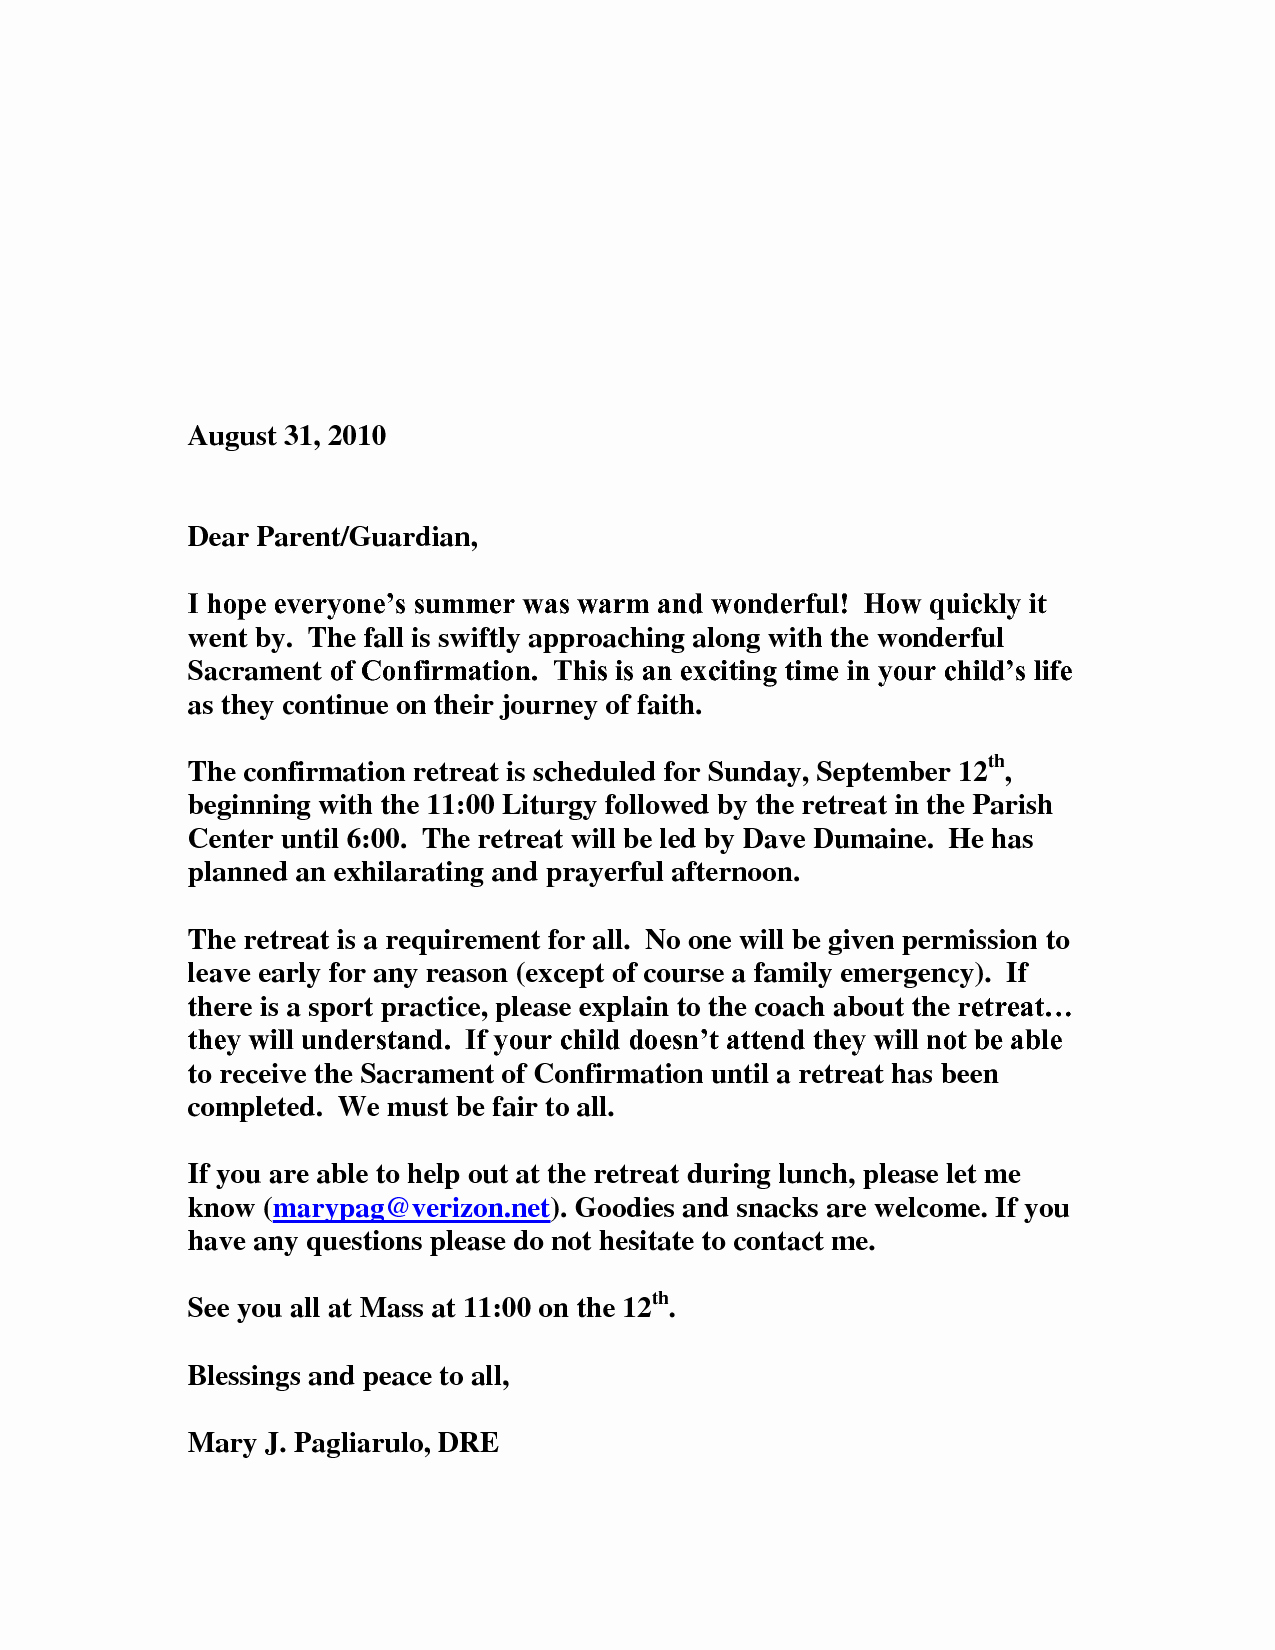 Kairos Letter Samples Best Of Best S Of Catholic Palanca Letters Sample Retreat